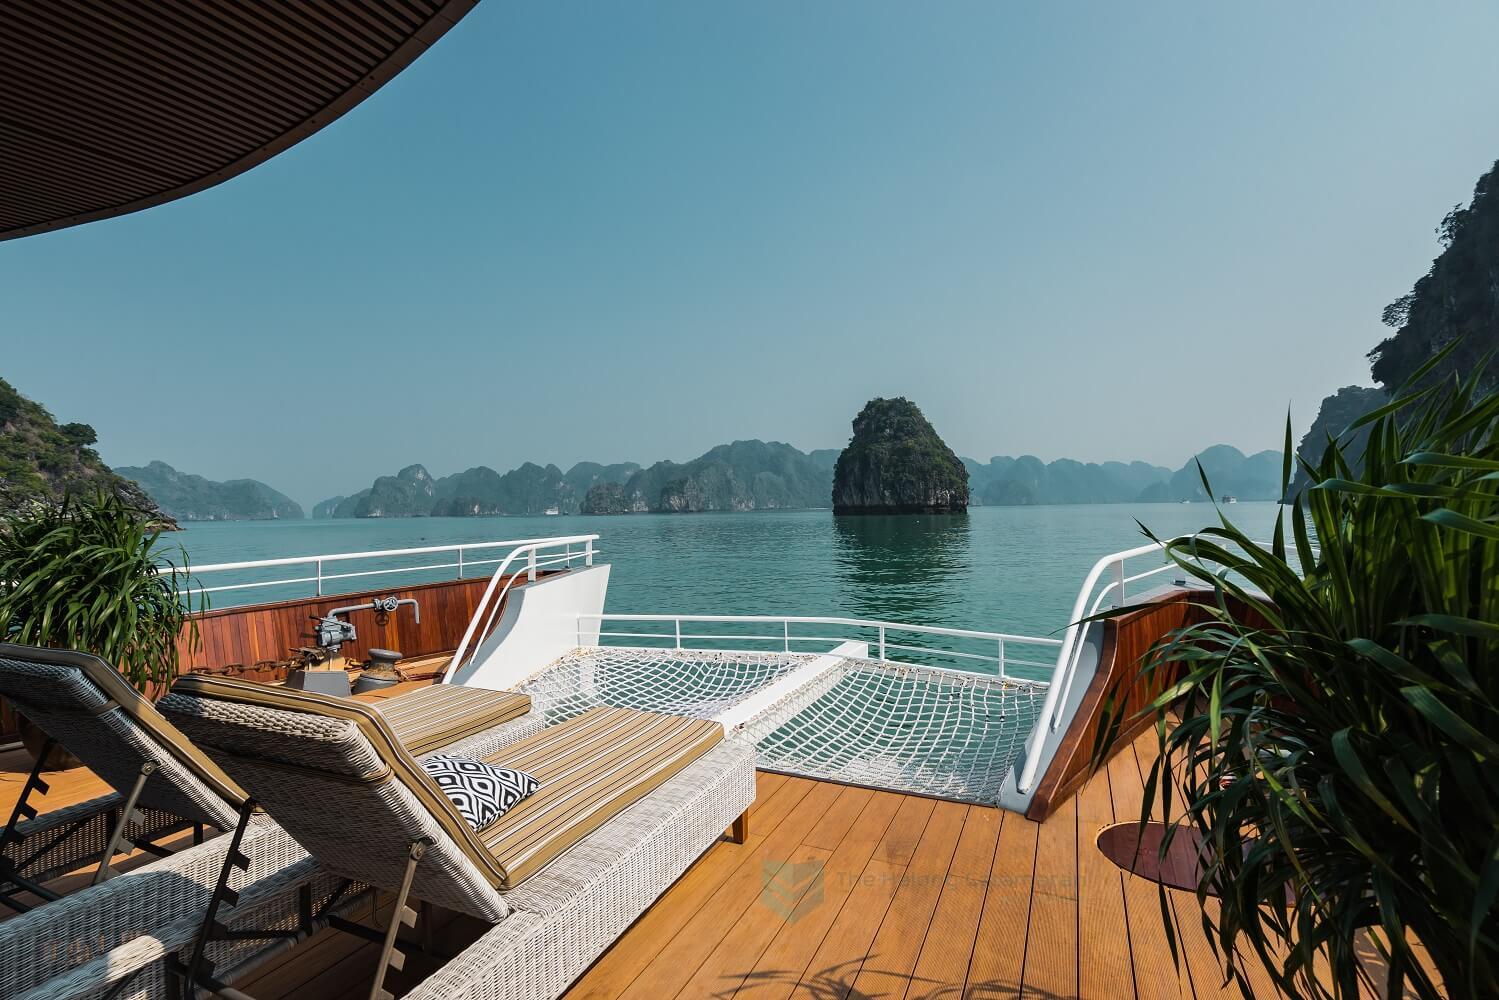 Lounge Net - Catamaran Cruise